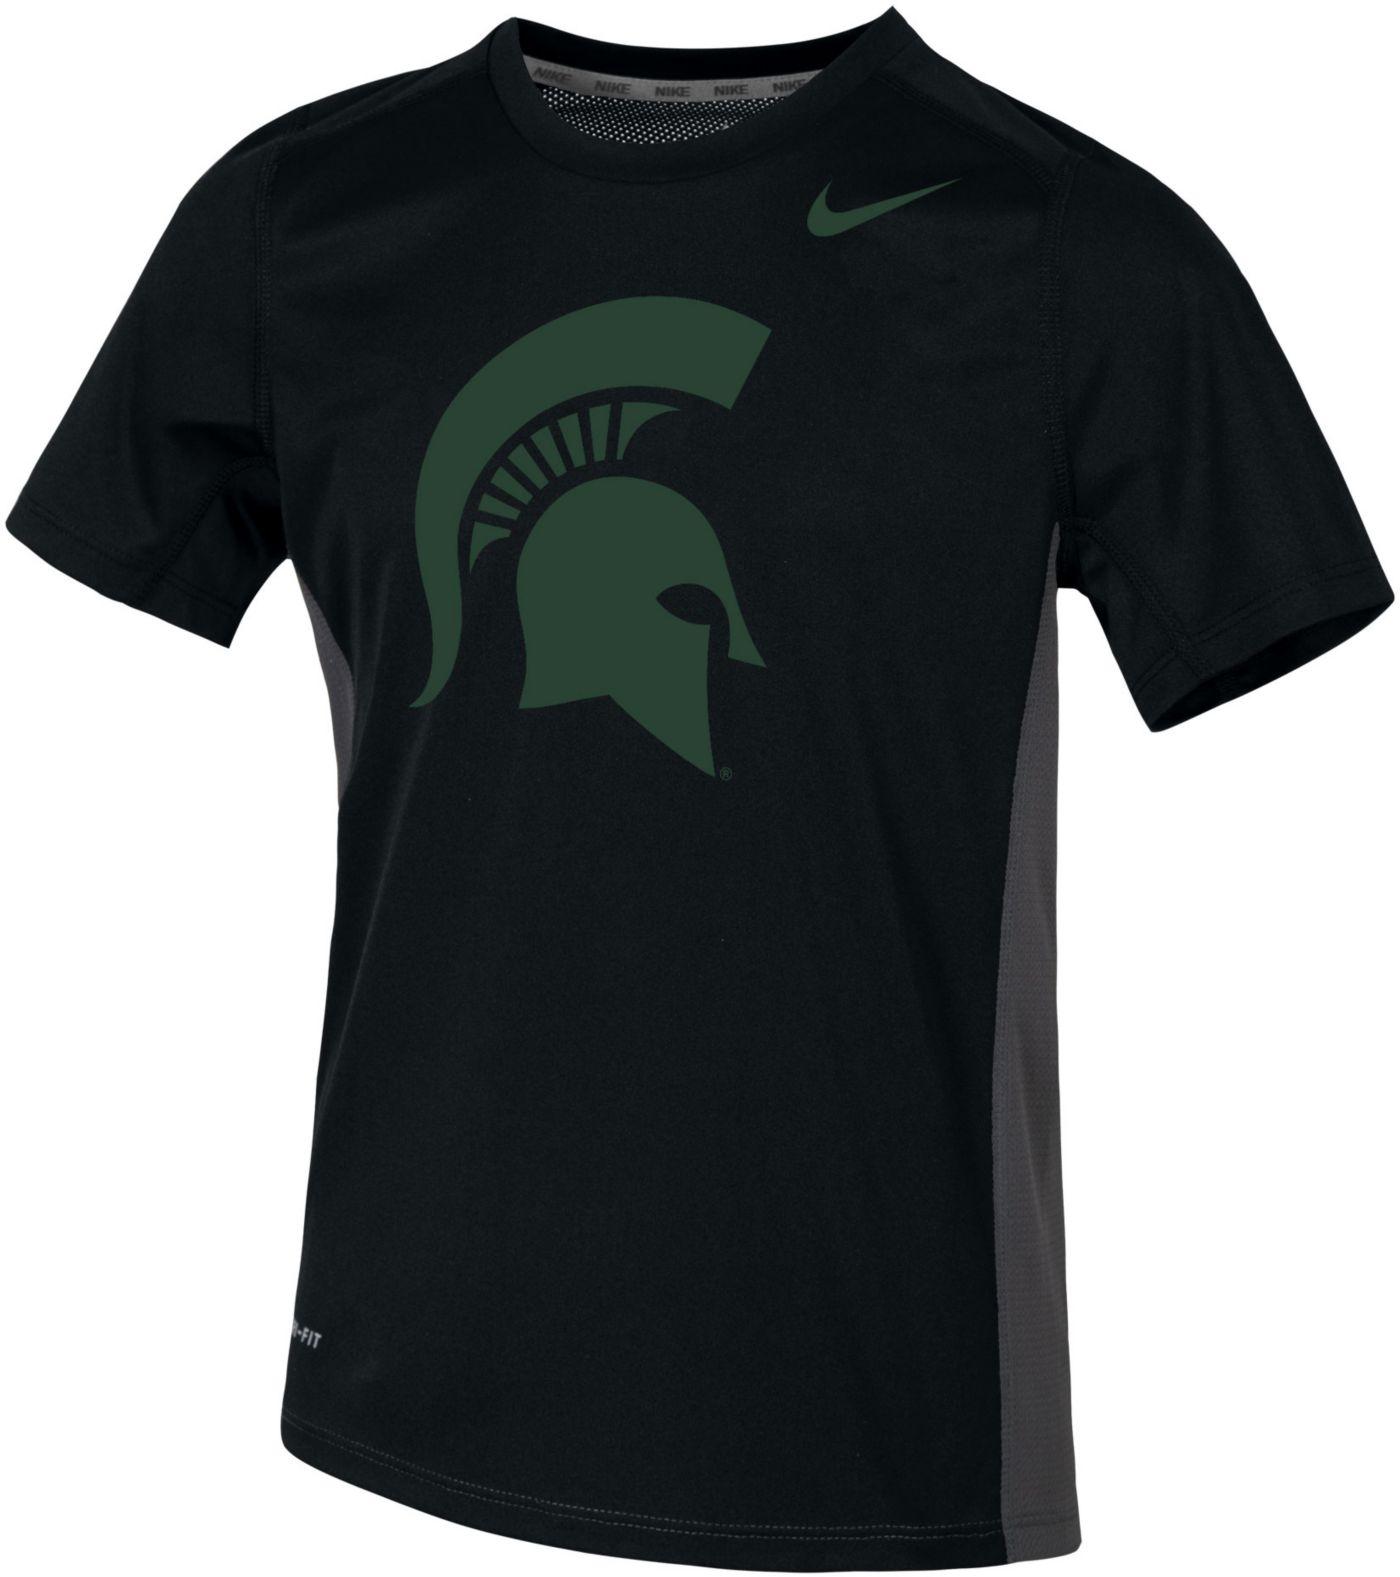 Nike Youth Michigan State Spartans Dri-FIT Miler Black T-Shirt